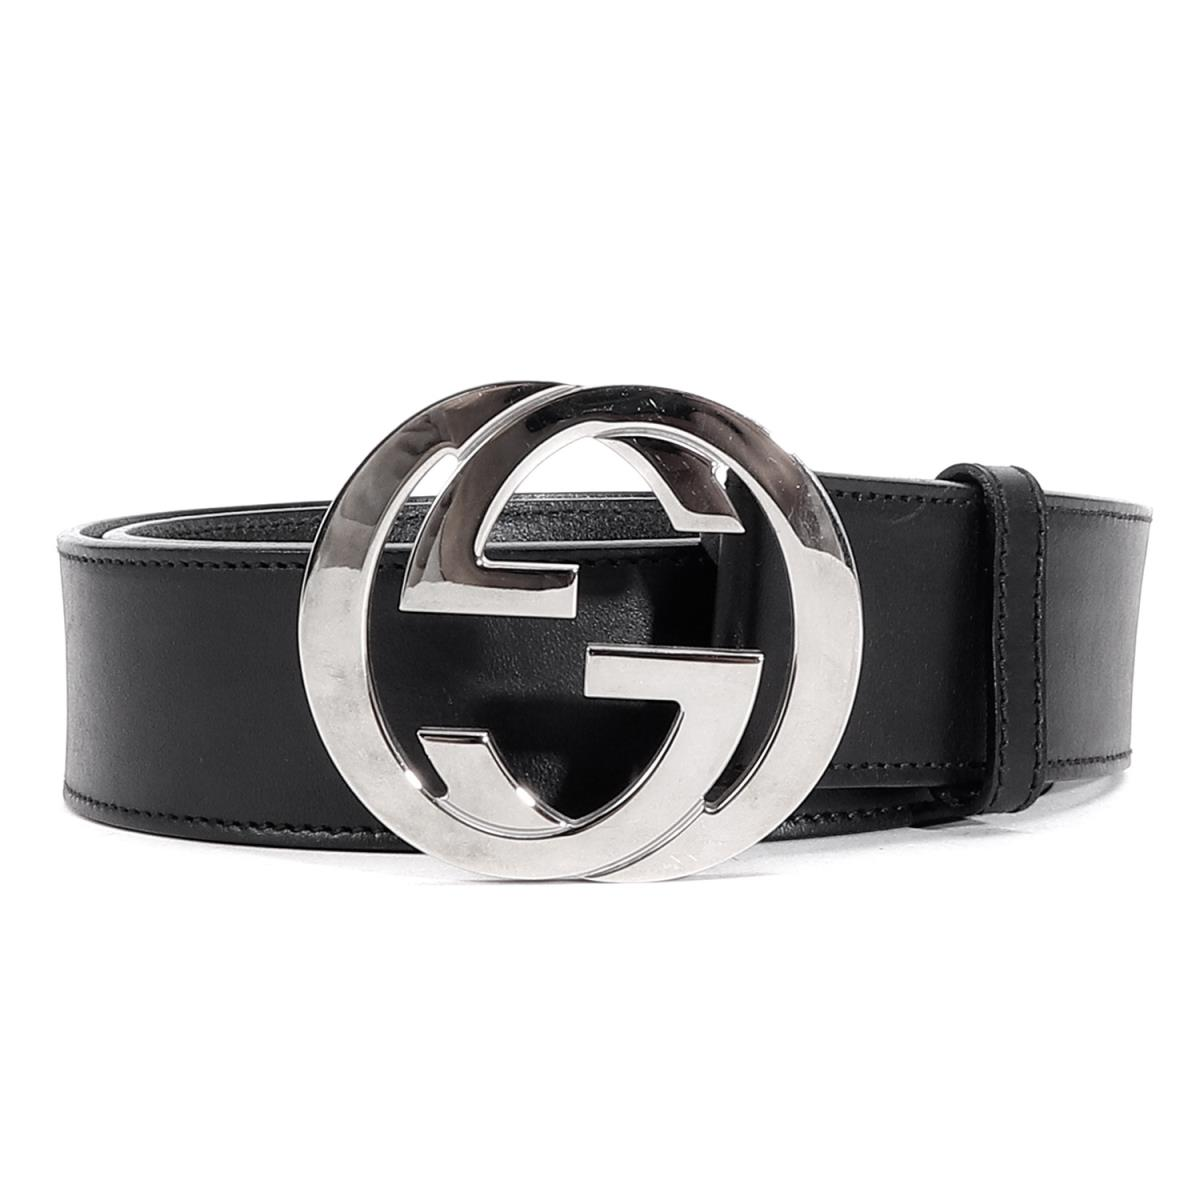 GUCCI (Gucci) GG buckle interlocking grip belt black 36 (90cm)